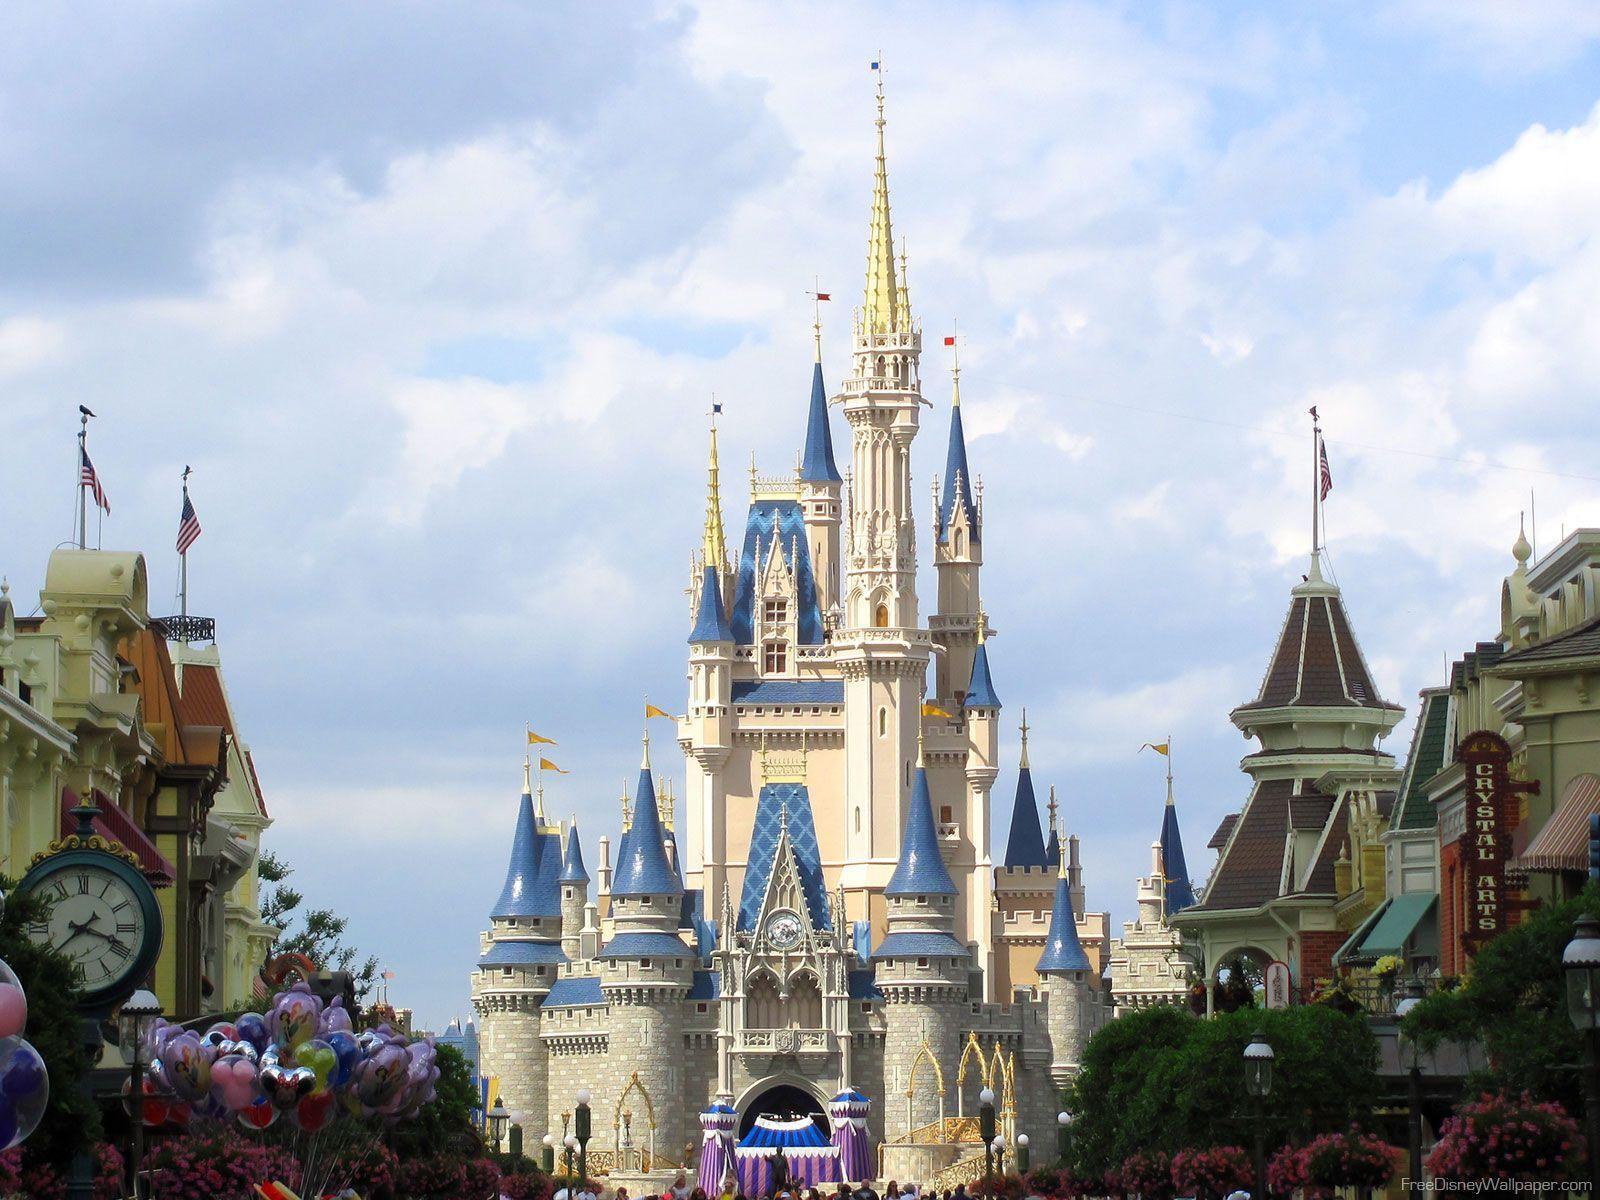 High Resolution Disney Wallpaper: Disney Castle Backgrounds